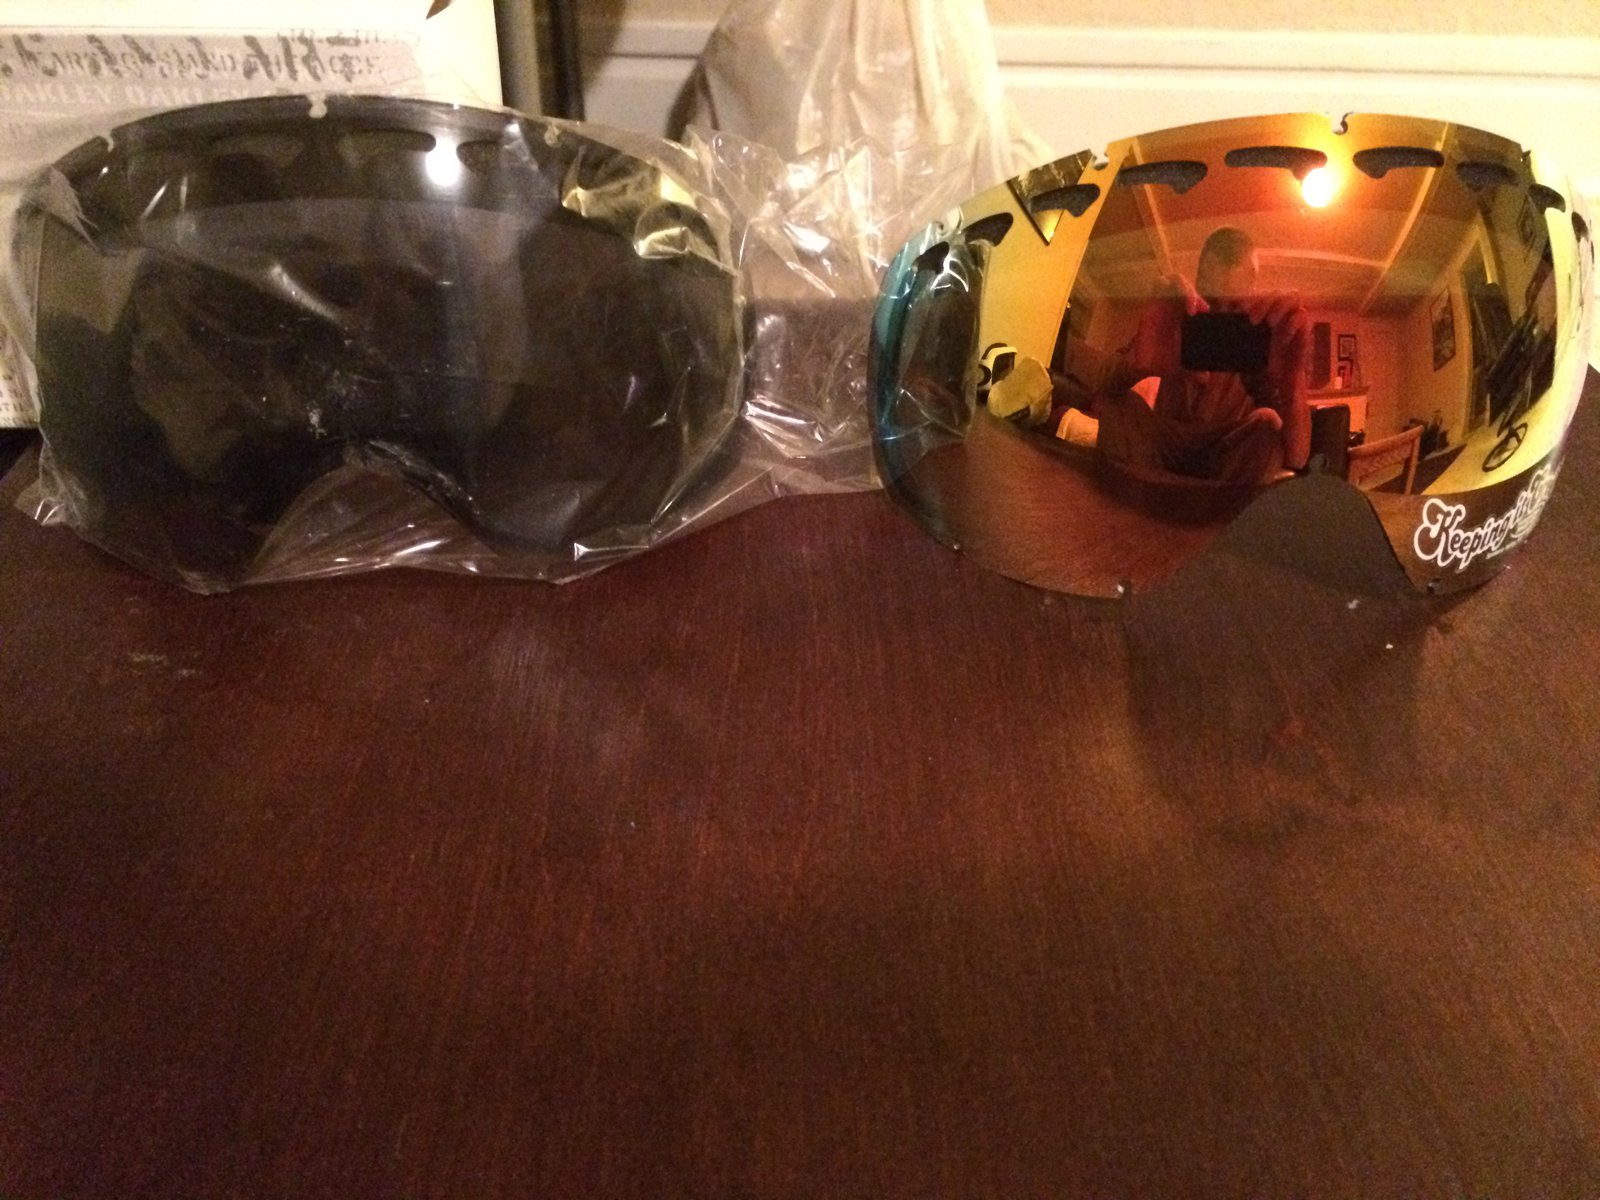 crowbar replacement lenses